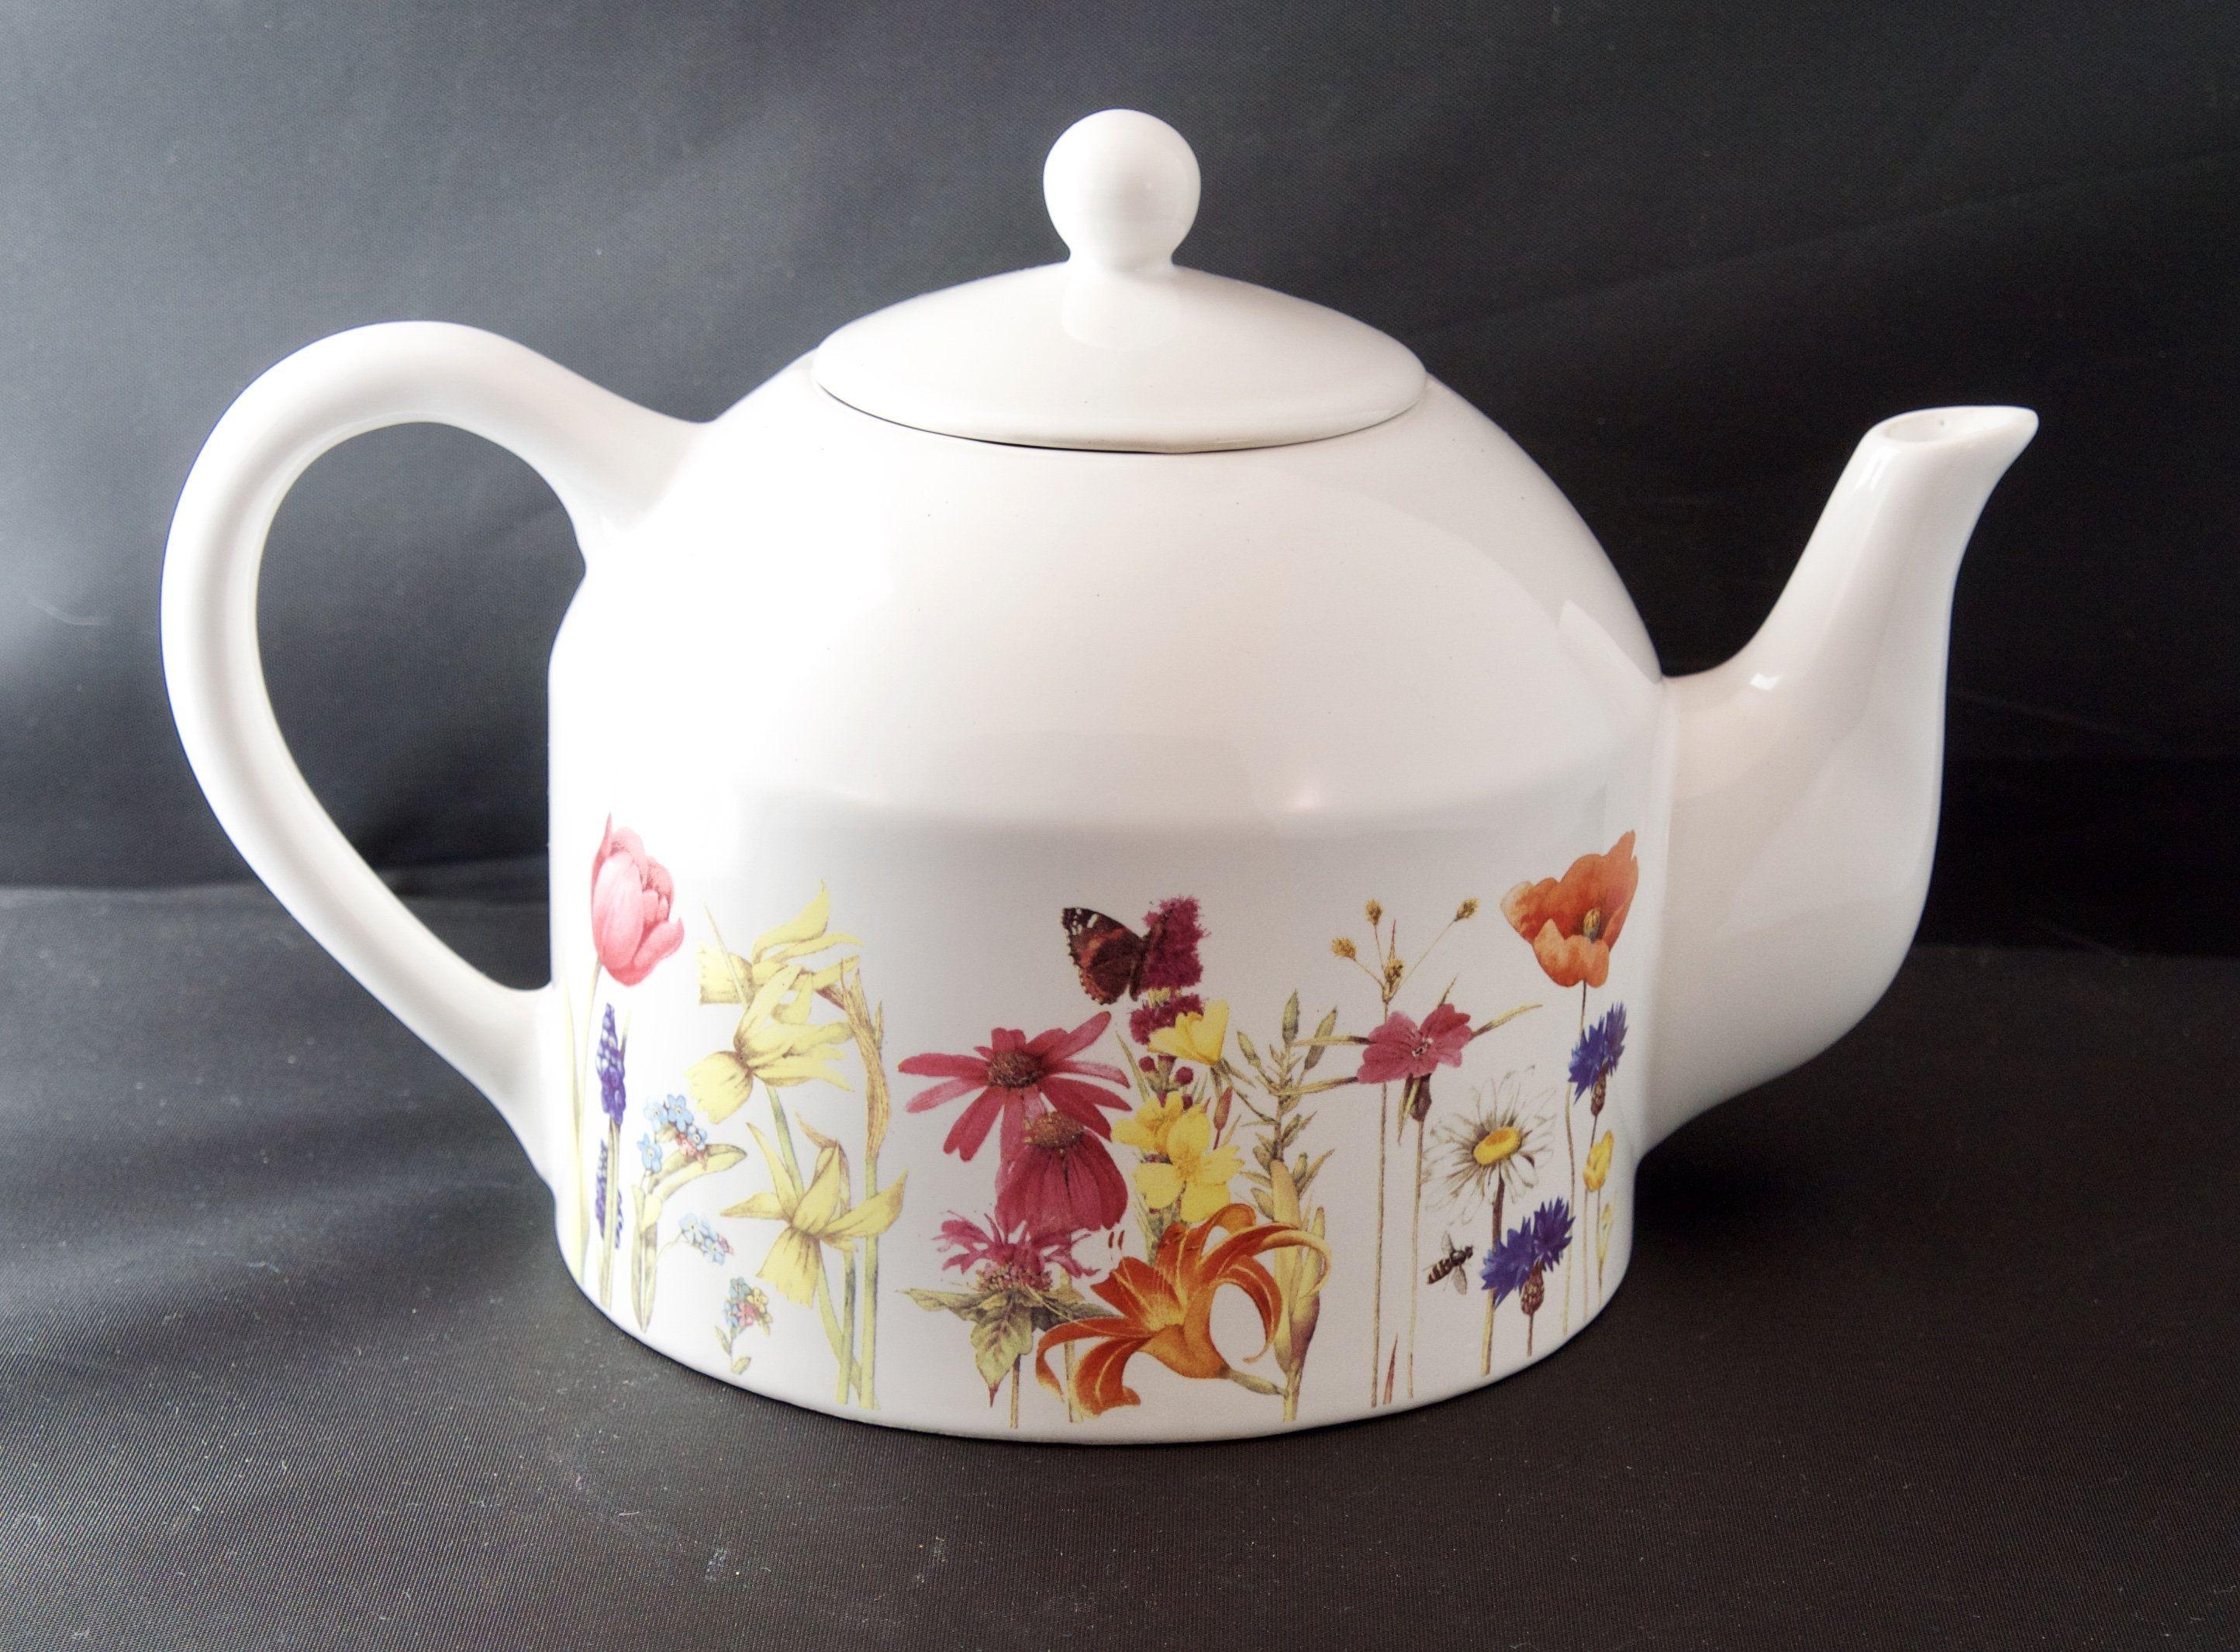 Wildflower Meadow Floral Teapot Maryjolein Bastin Hallmark White And Flower Teapot Country Kitchen Tea Lover Gift Tea Lovers Gift Tea Pots Tea Lover